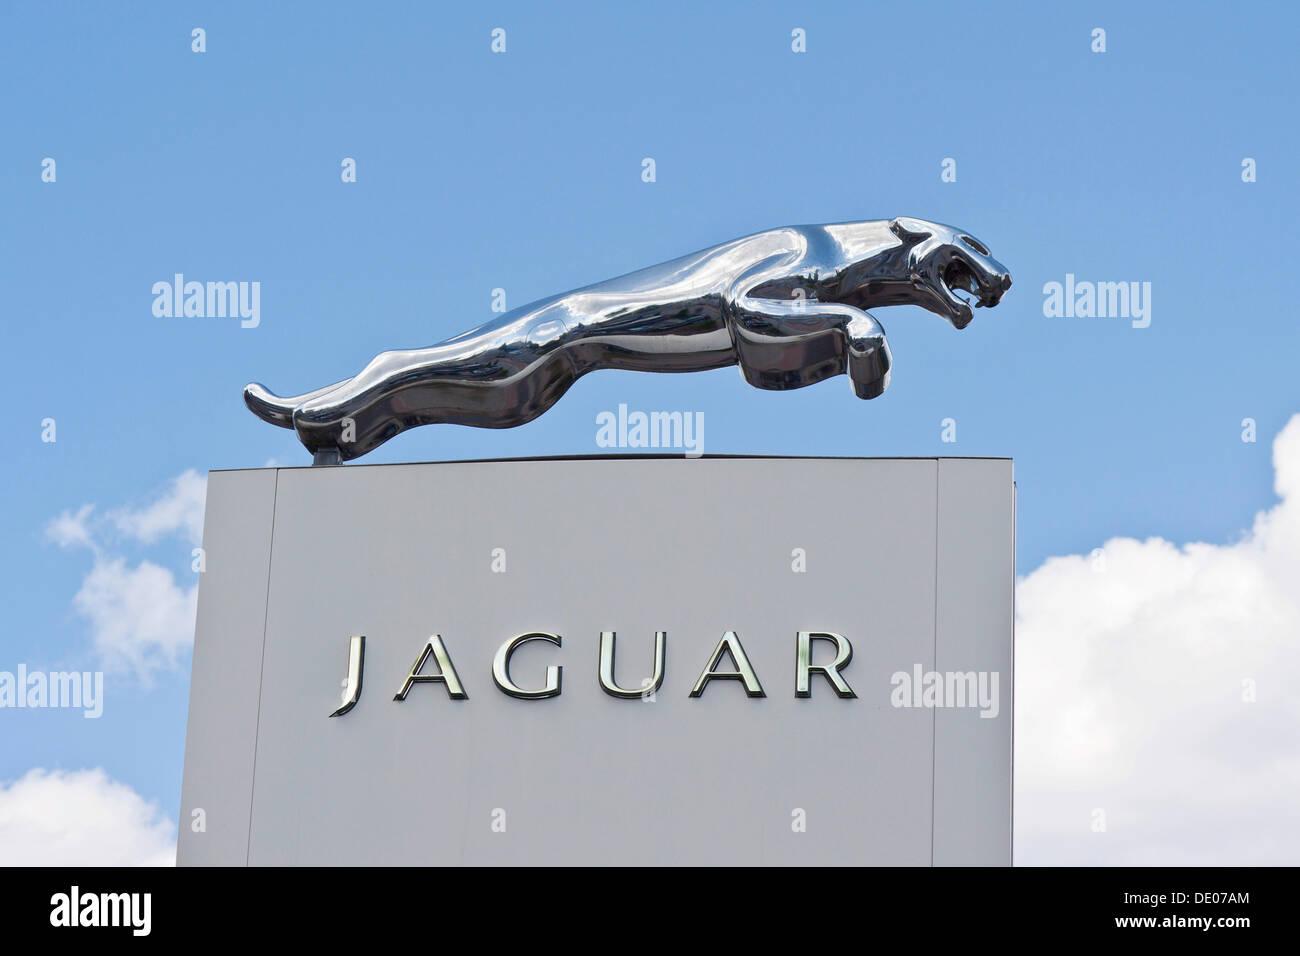 Jaguar Cars Ltd A British Luxury And Sports Car Manufacturer Logo